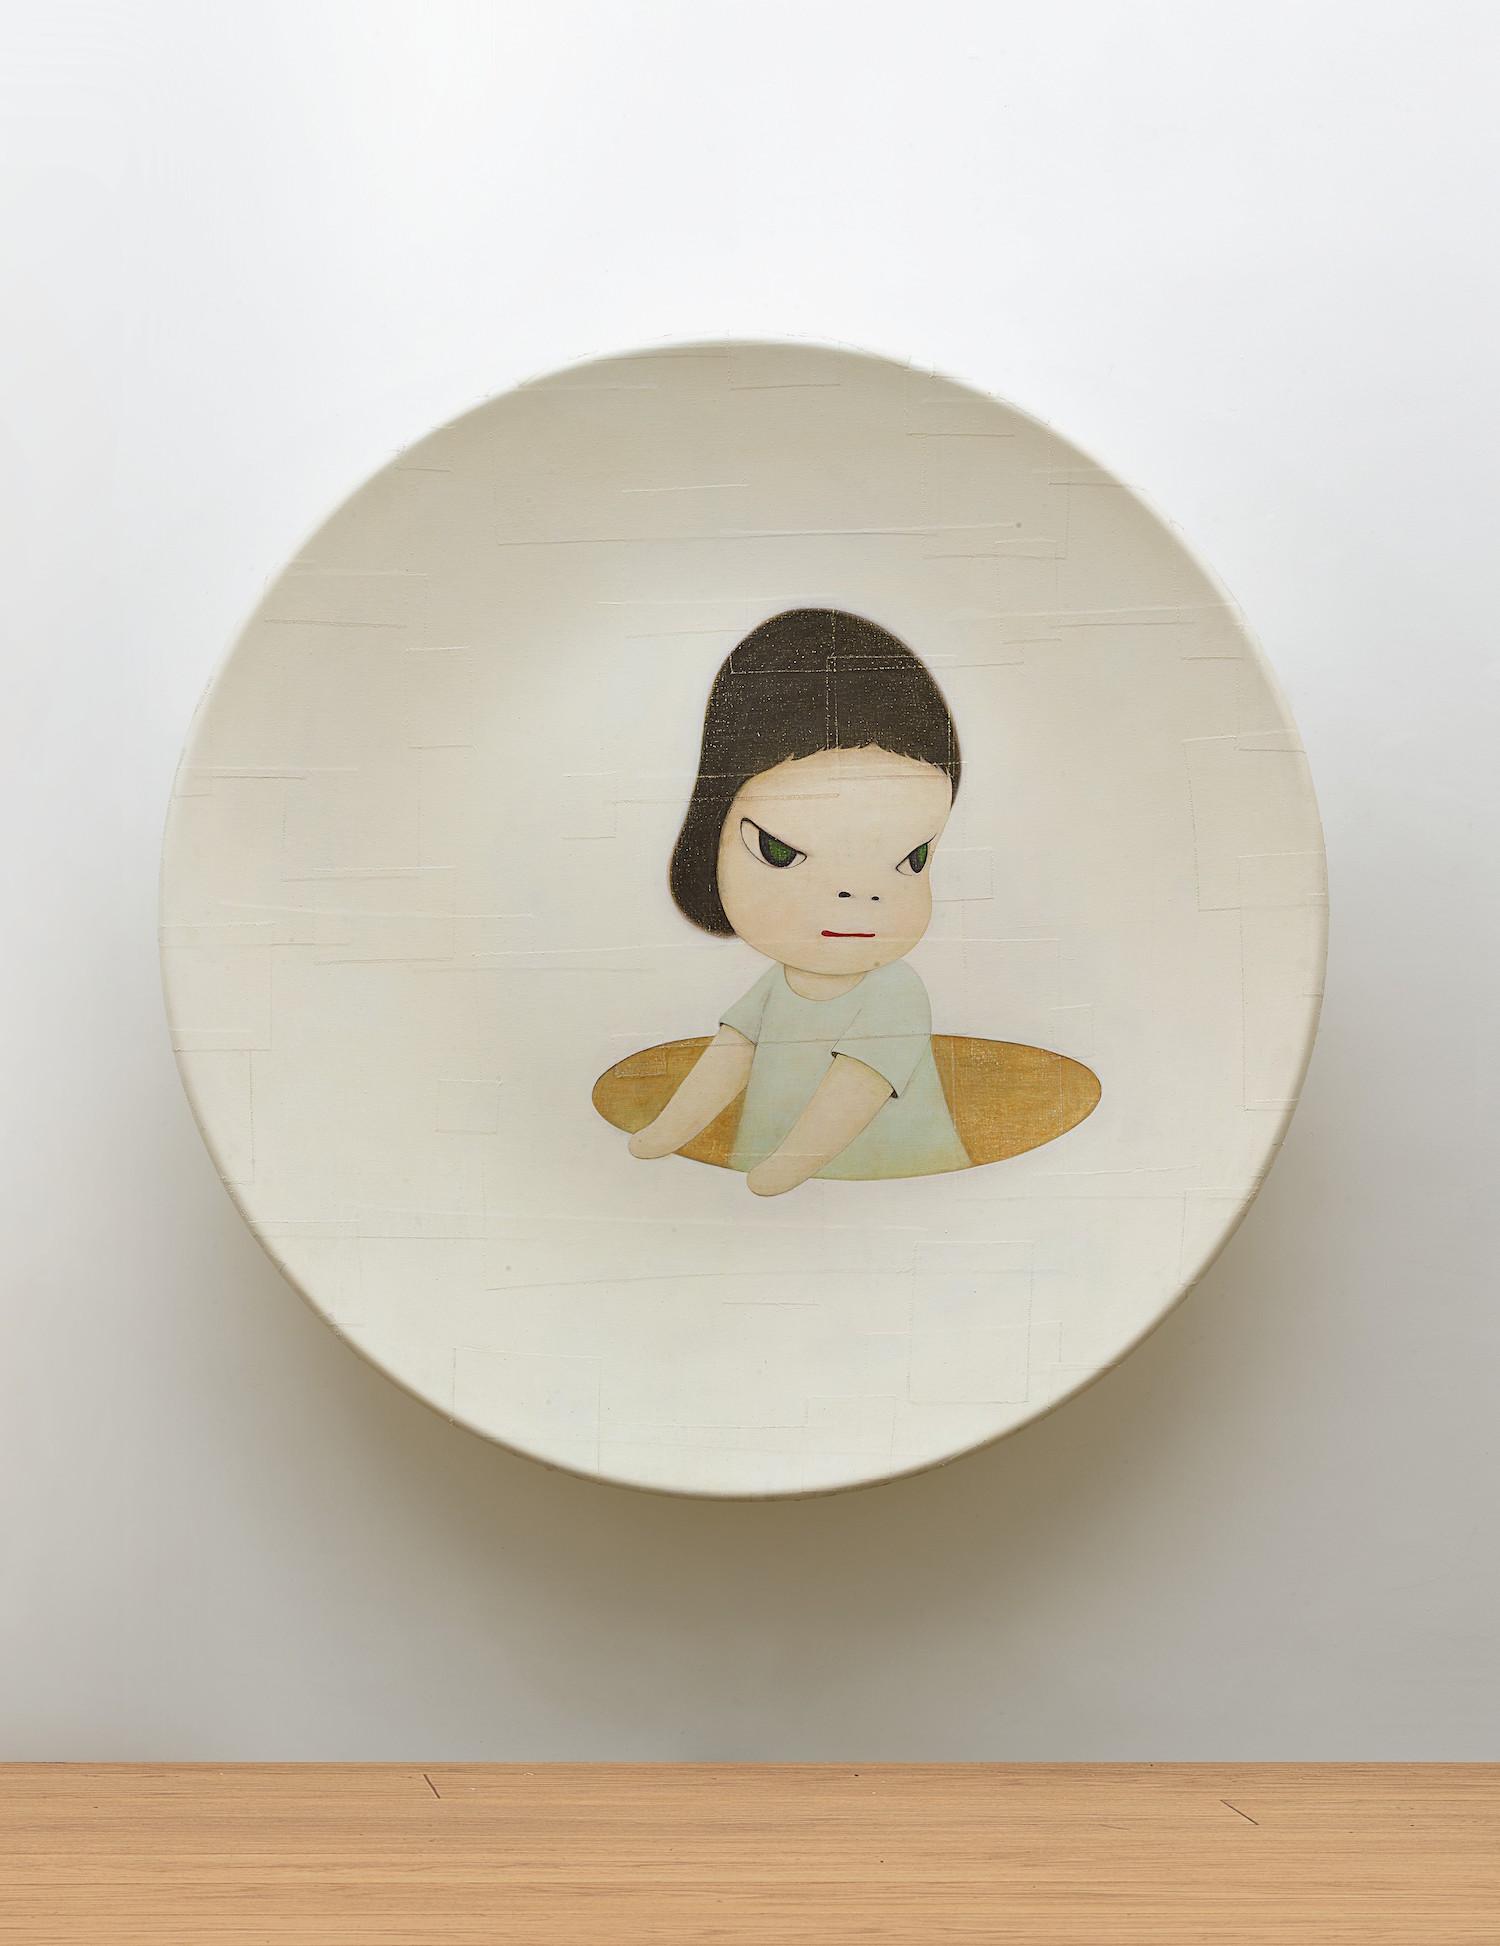 Yoshitomo Nara, 'Ready to Scout', 2001, acrylic on cotton mounted on FRP, 177.8 (diameter) x 25.4 cm. Image courtesy of Sotheby's HK.